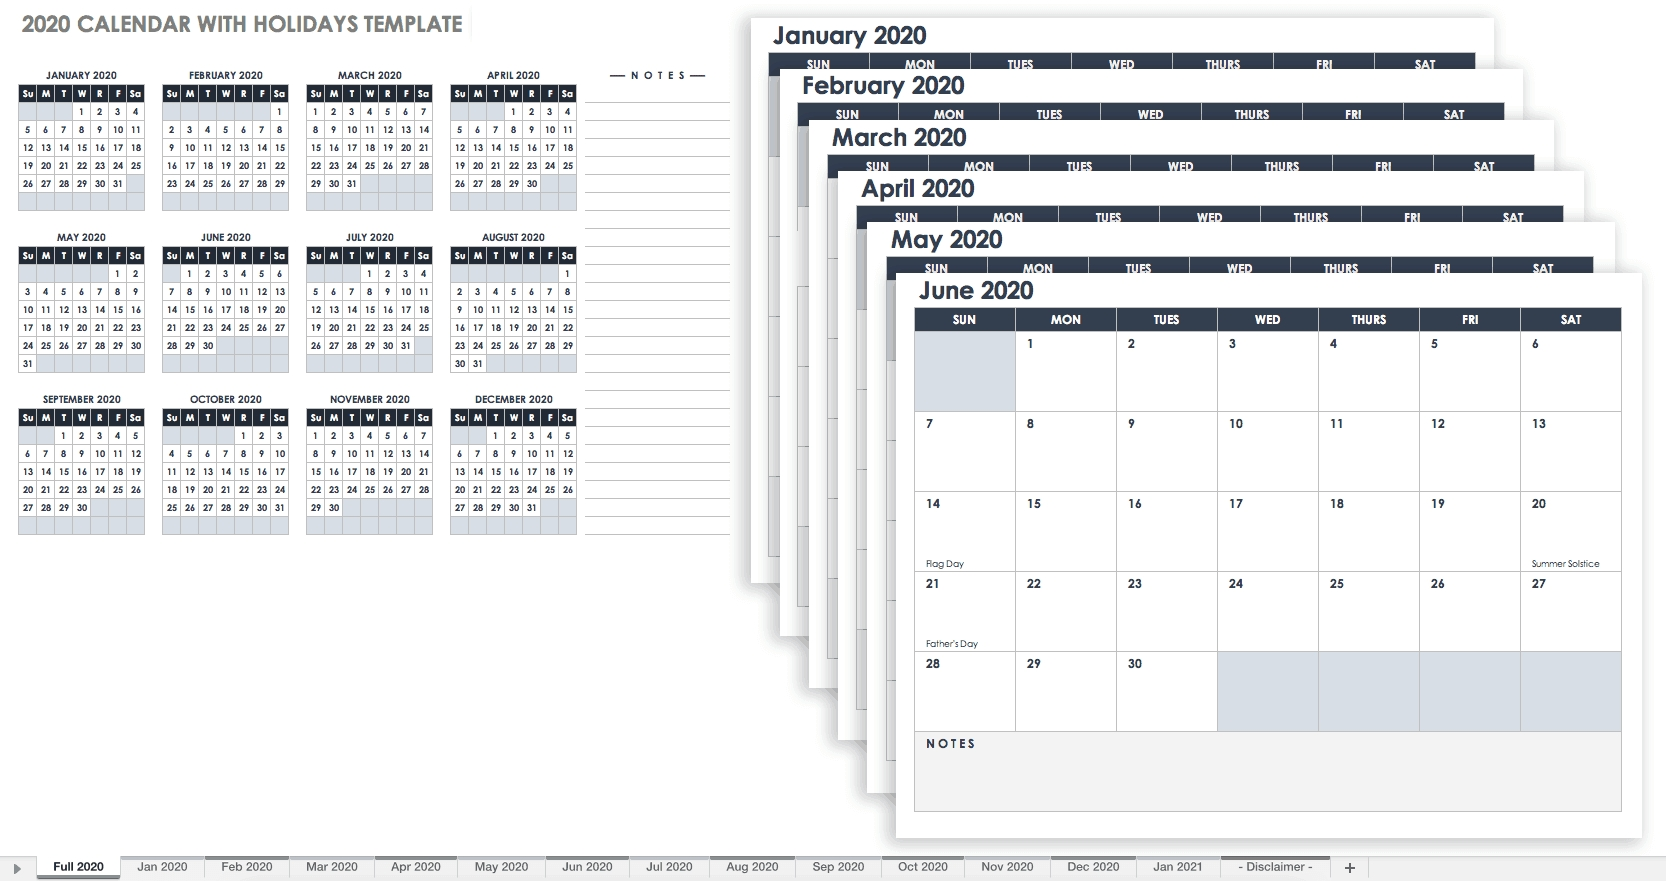 Free Google Calendar Templates | Smartsheet-Calendar Template For Google Sheets